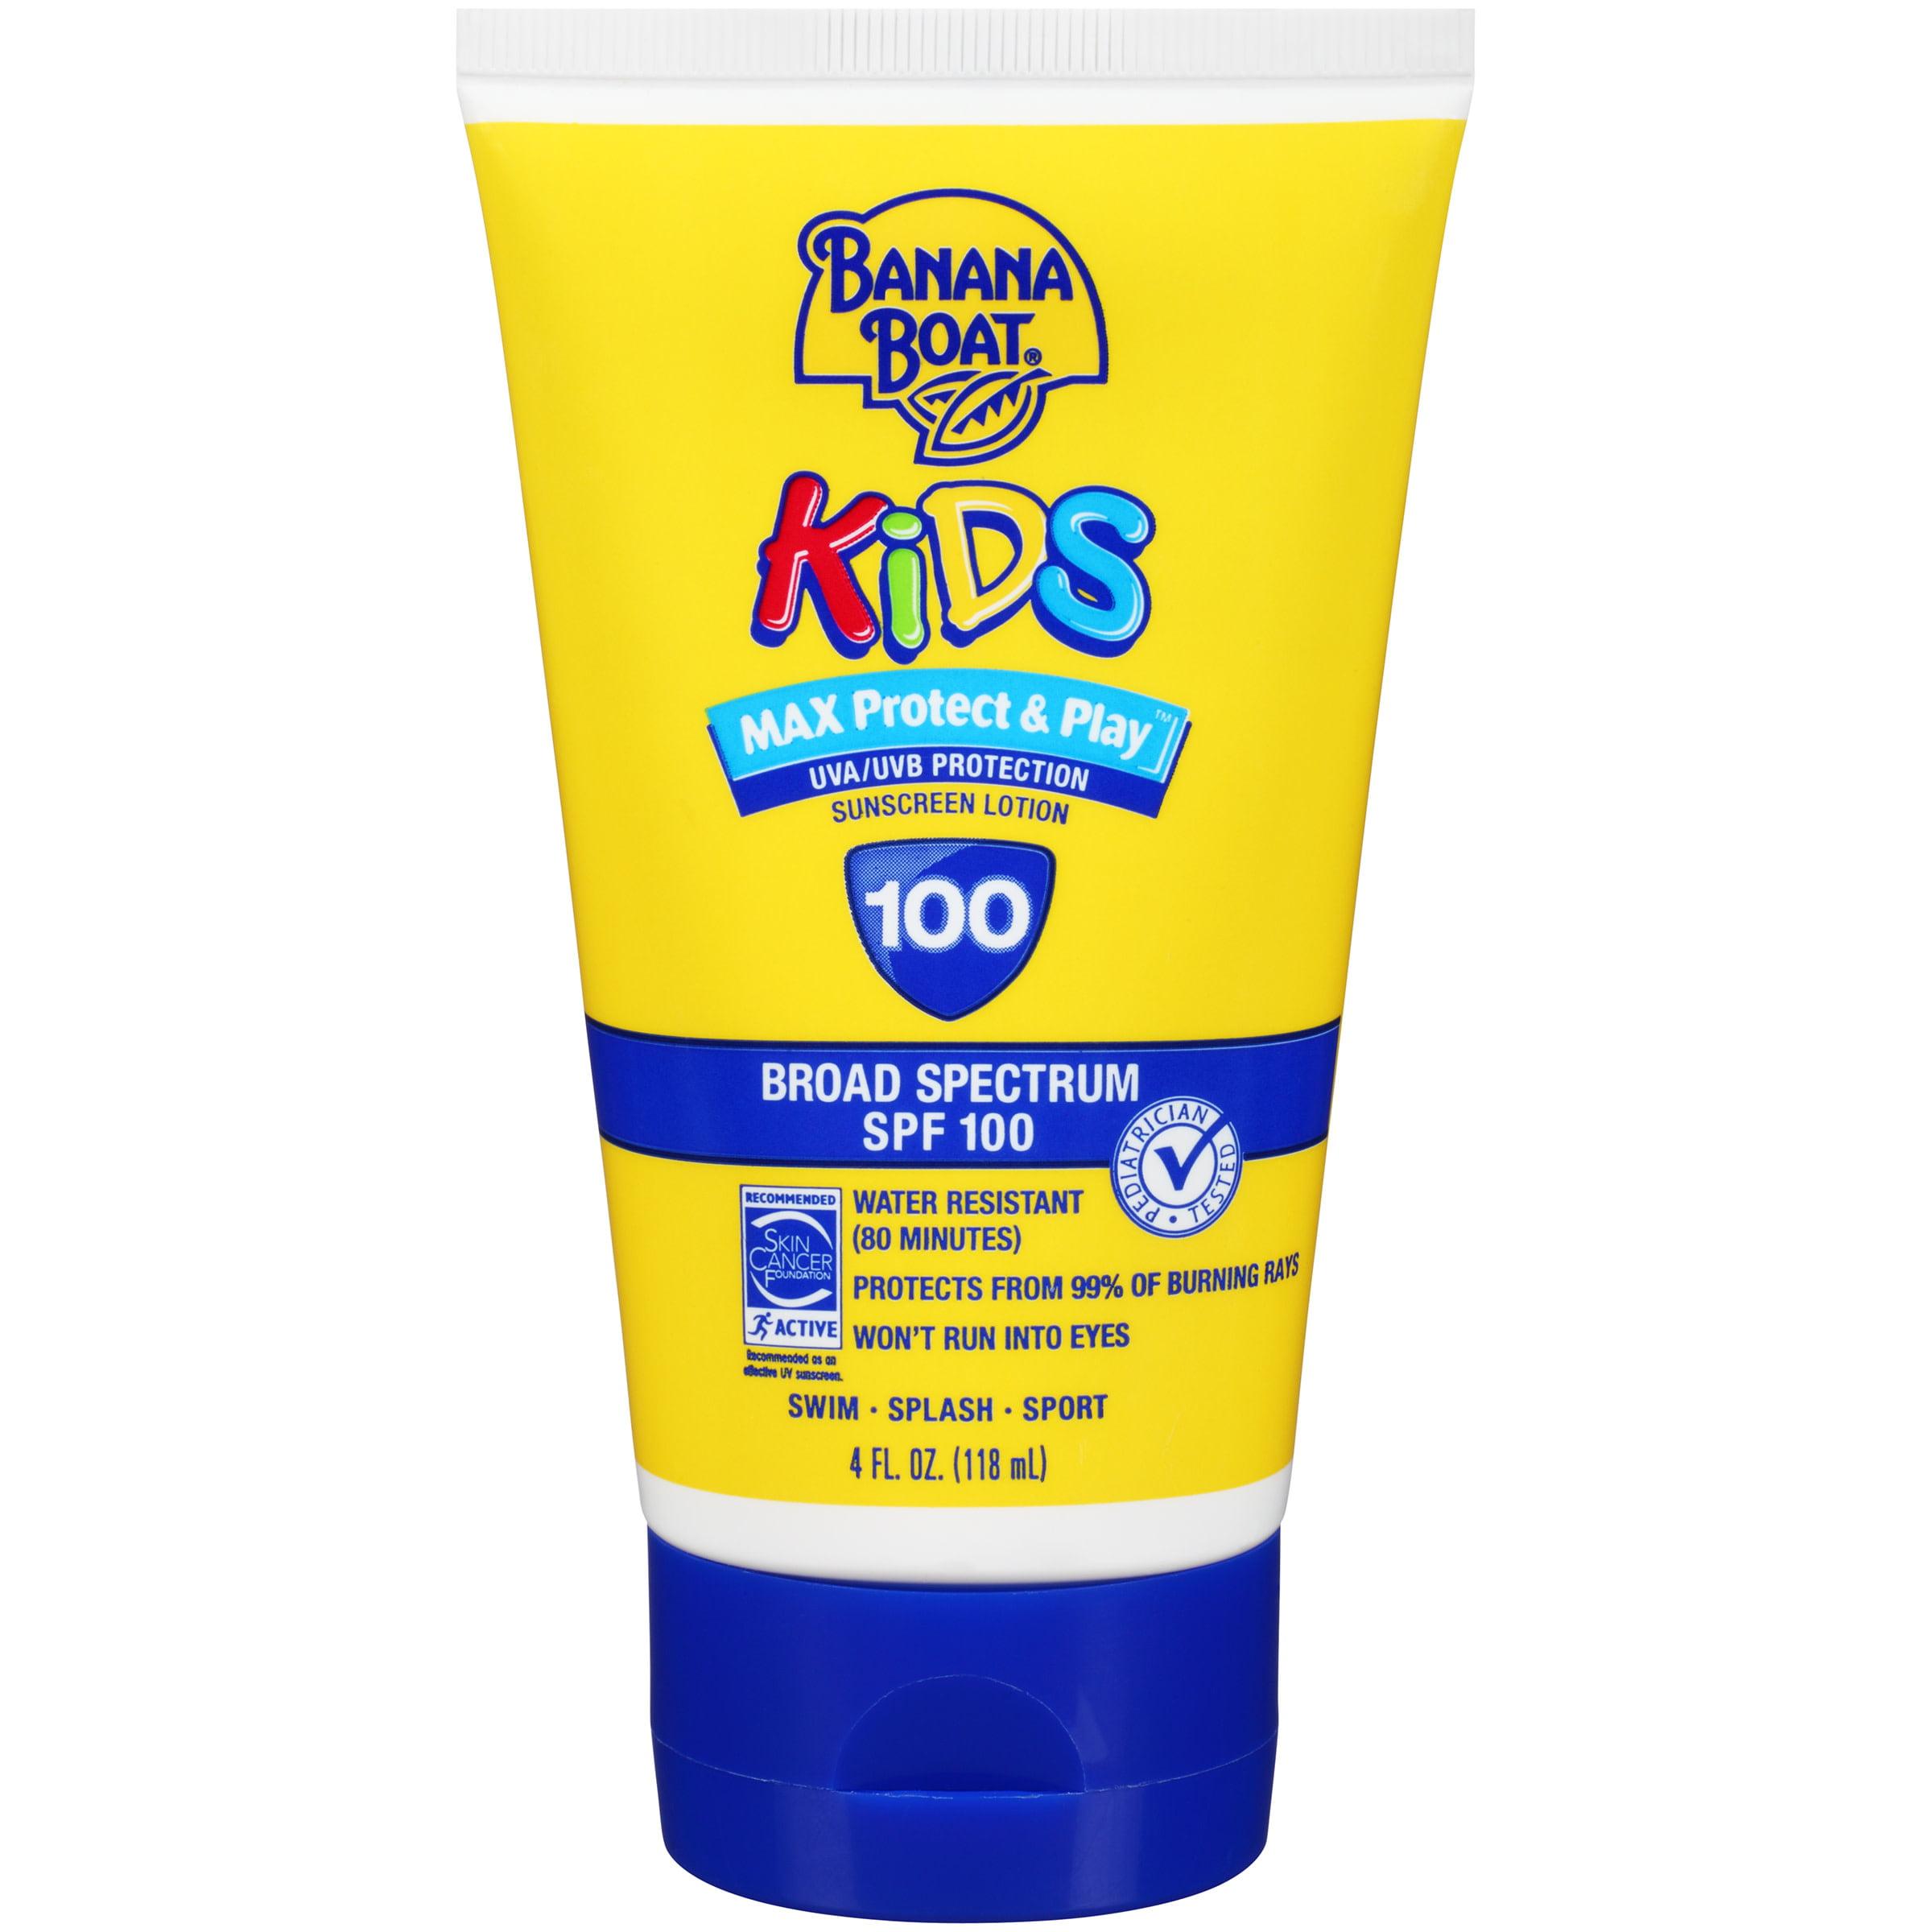 Banana Boat Kids Max Protect & Play Sunscreen Lotion SPF 100, 4 Oz